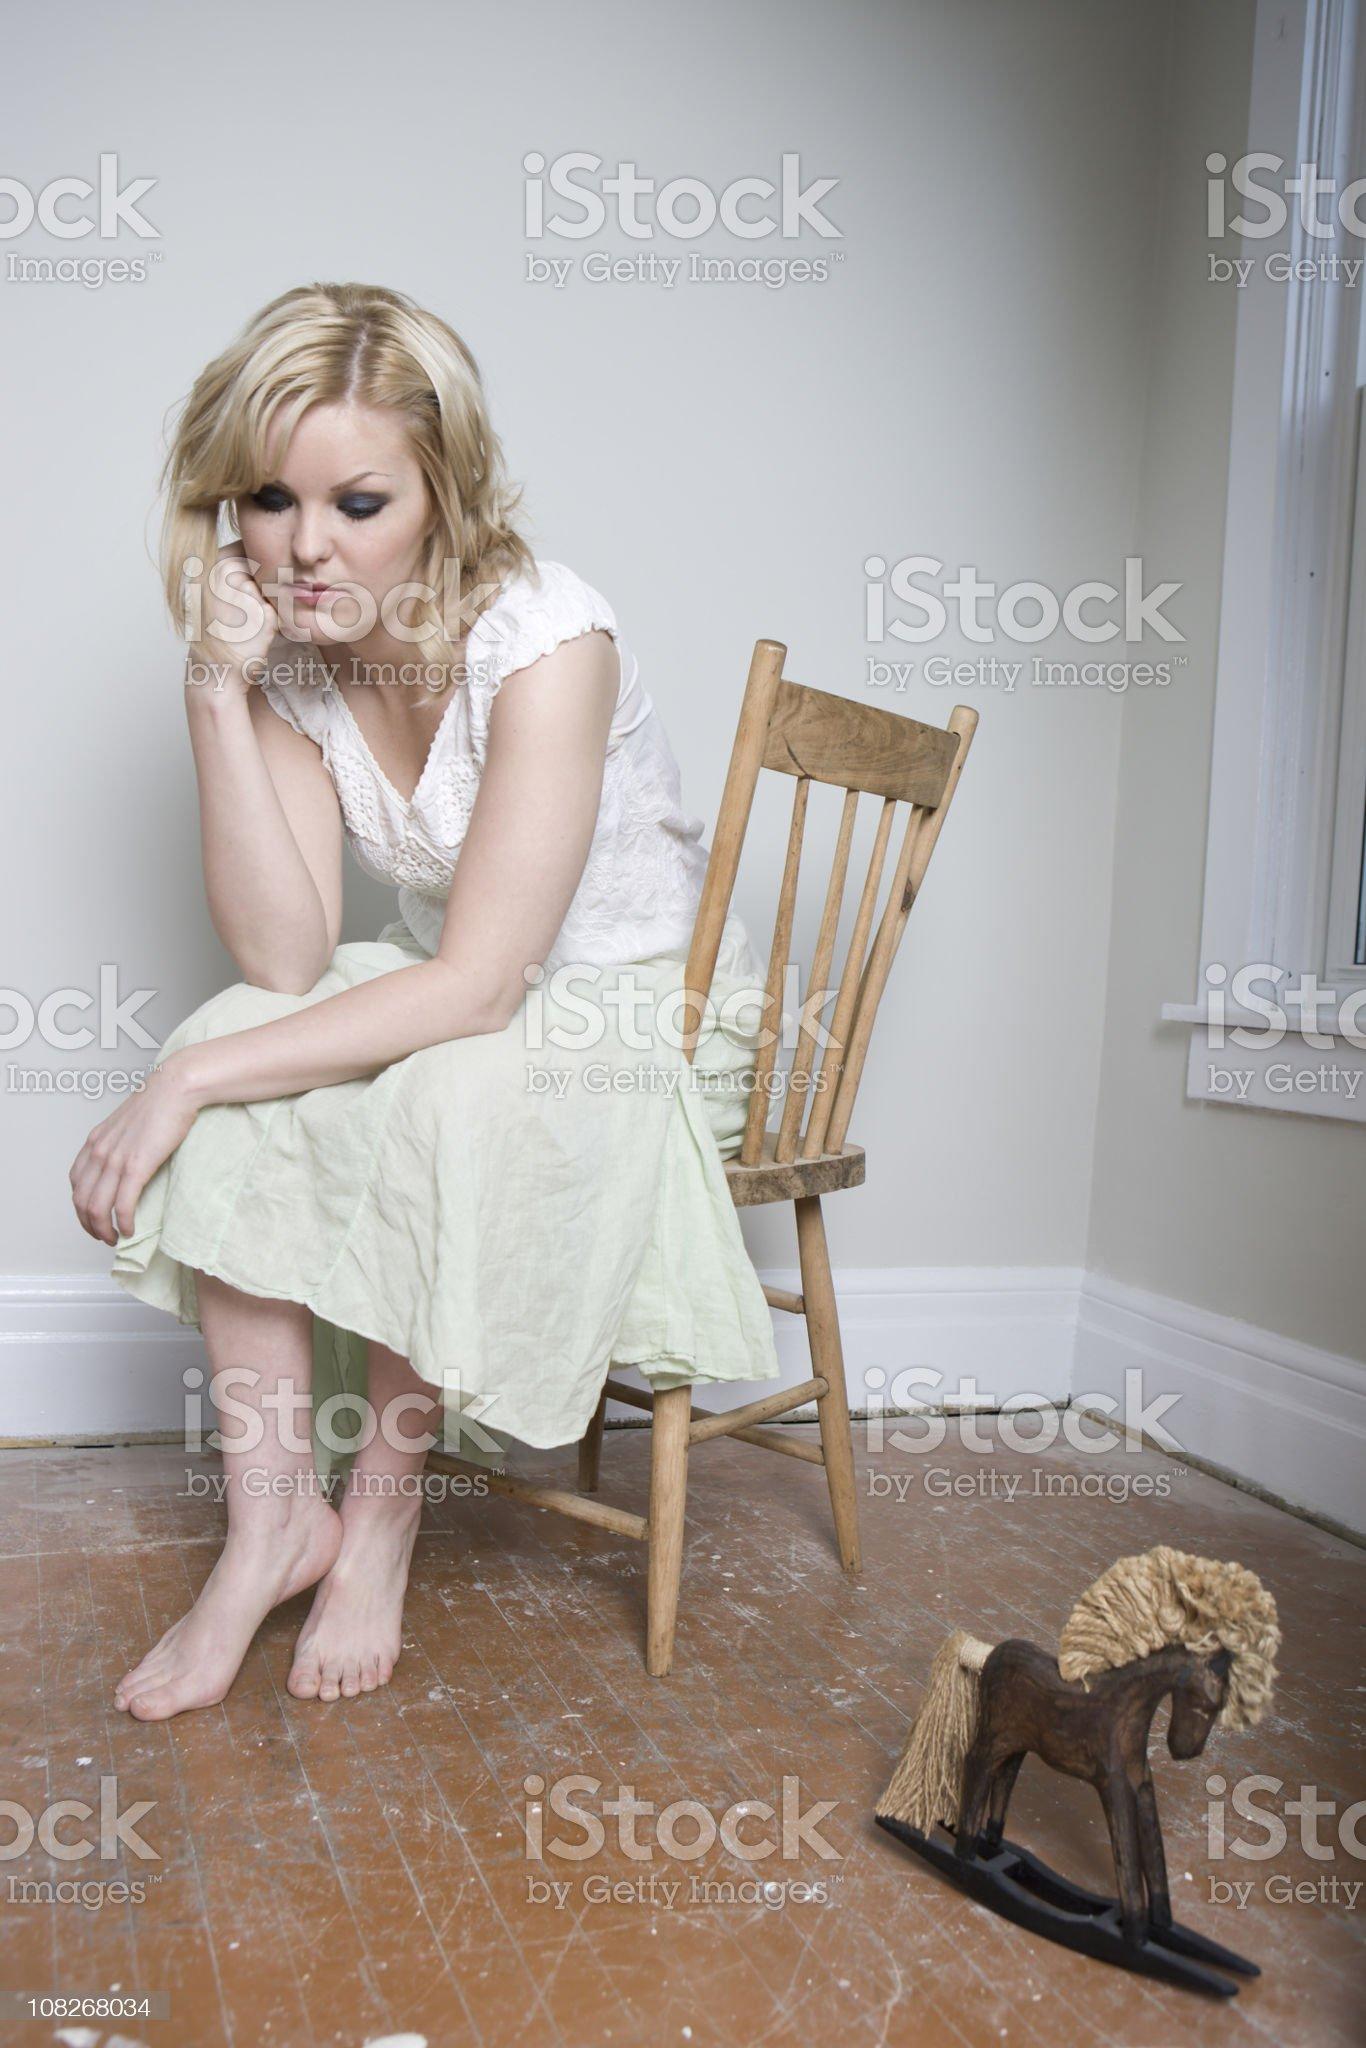 Blond Girl Looking Sad royalty-free stock photo